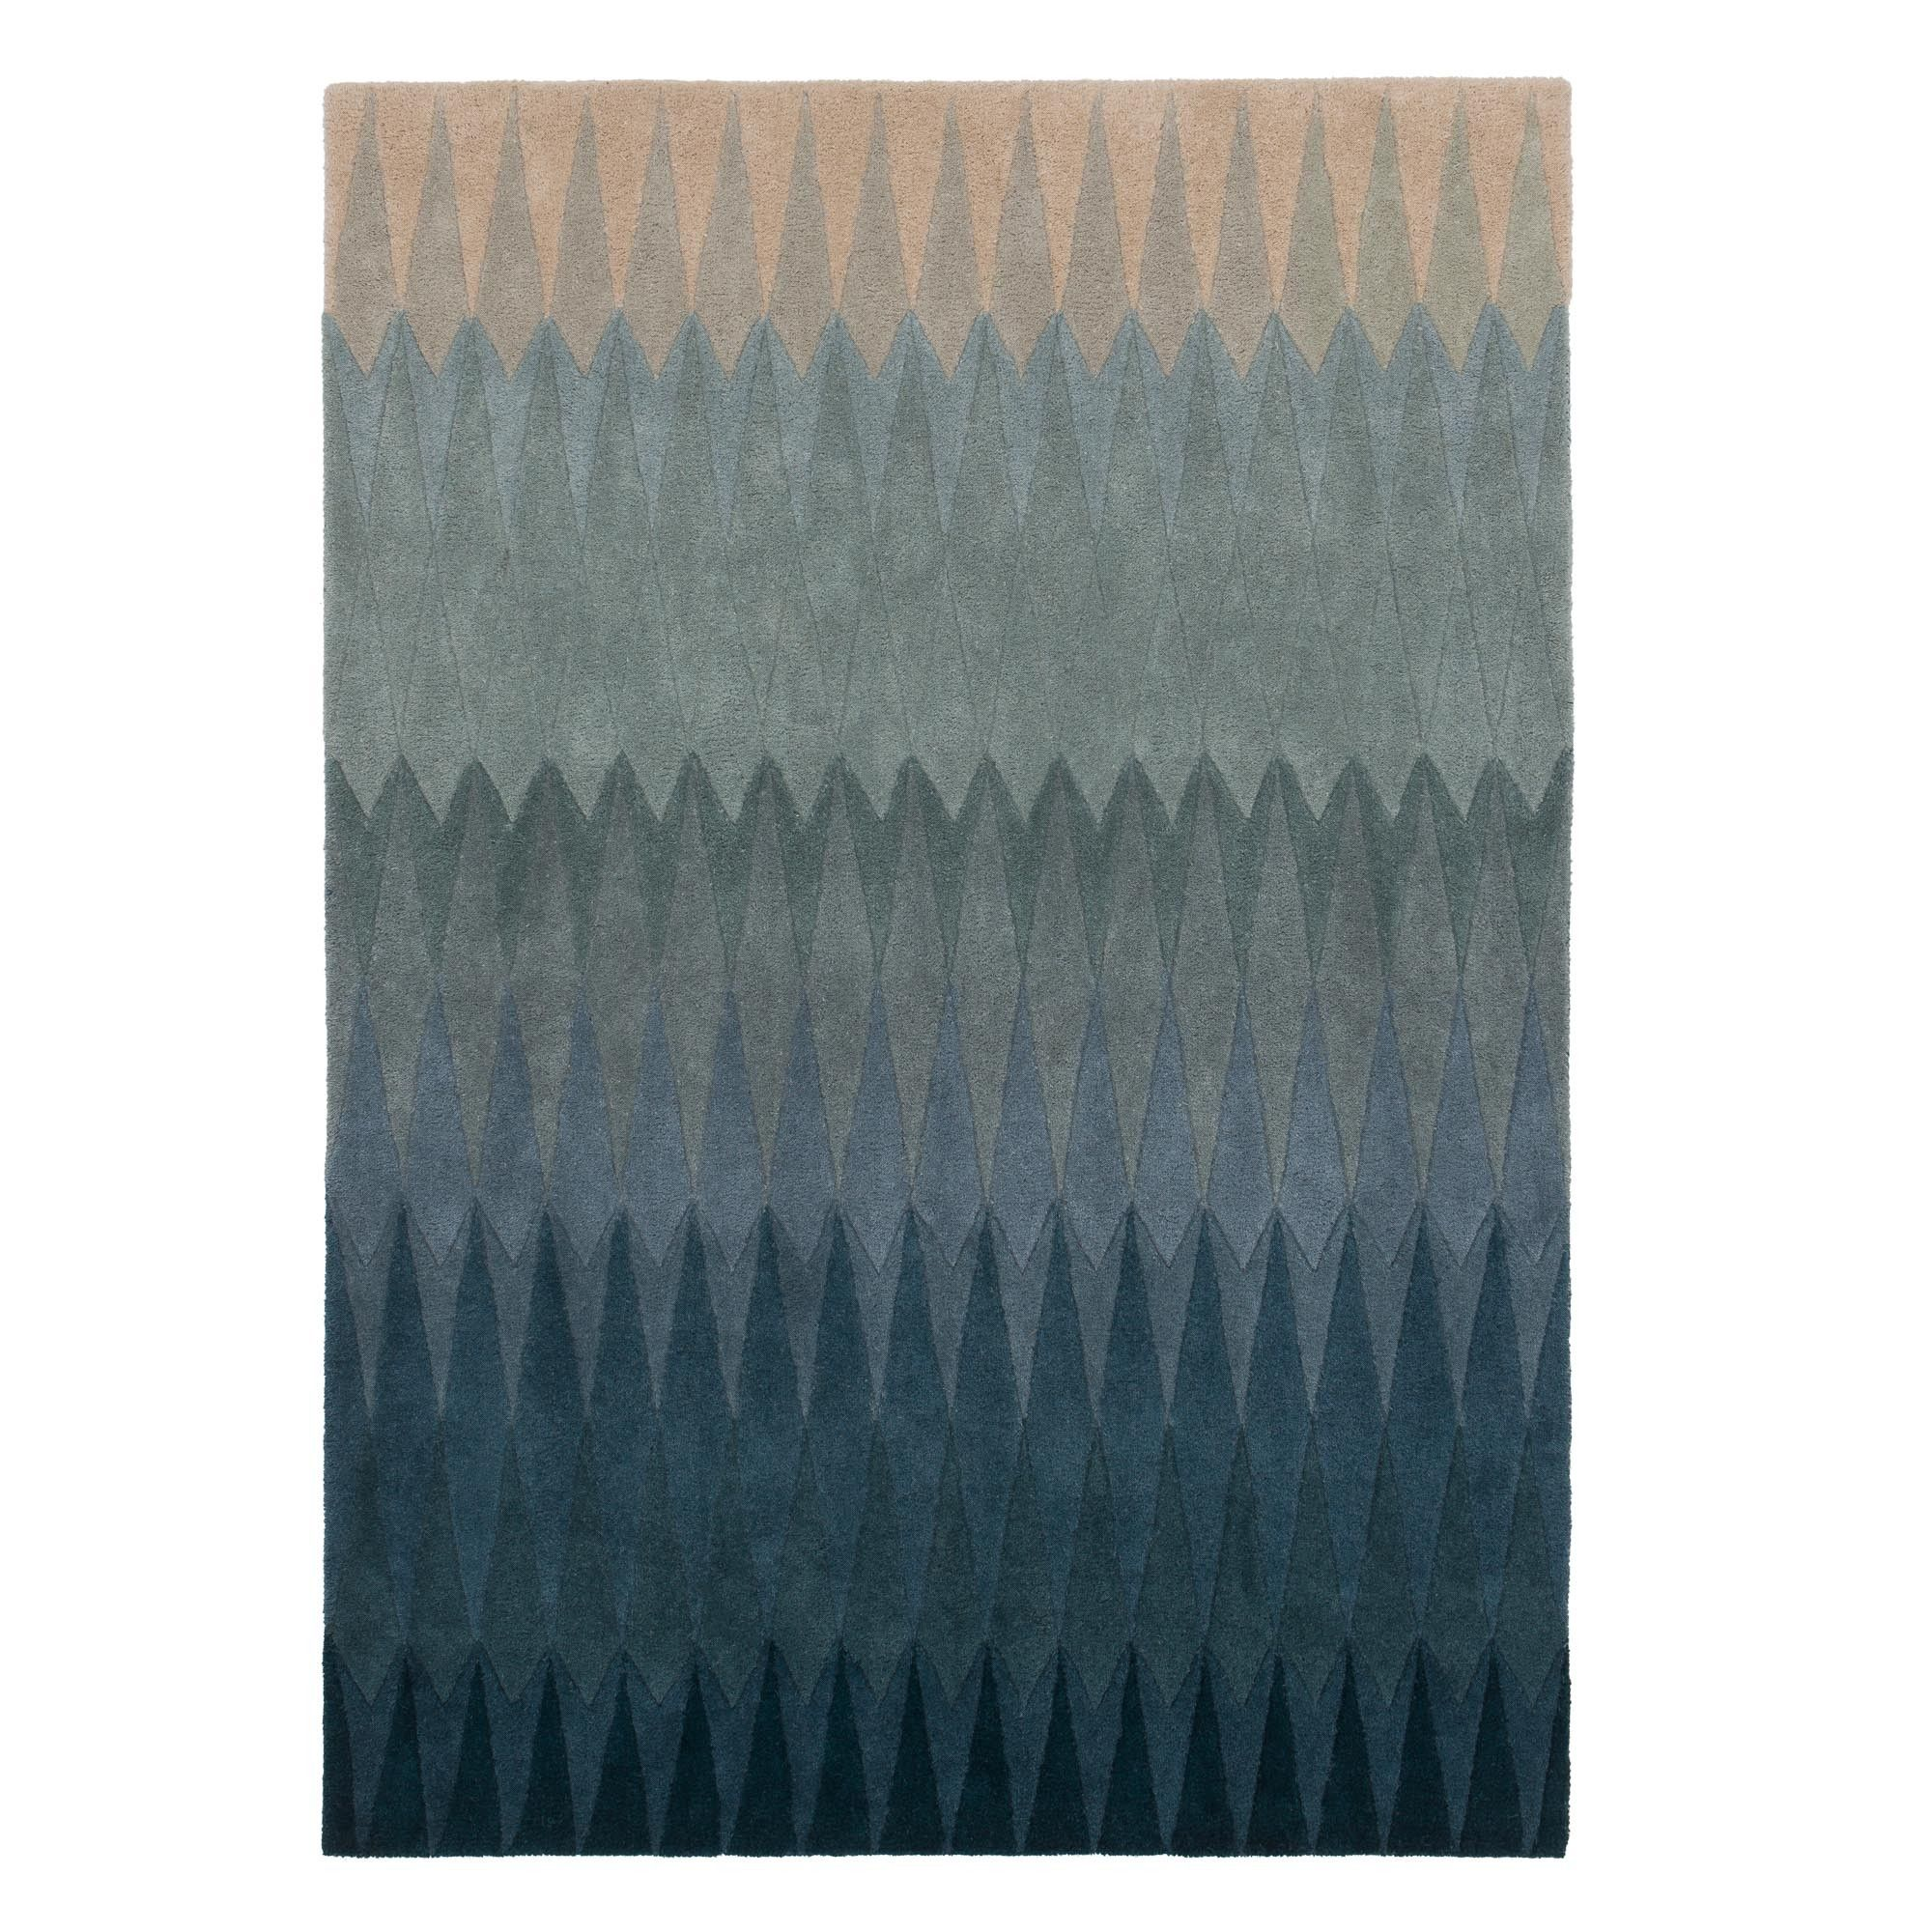 teppich karise minzgr n t rkis petrol 140x200 cm arch rugs pinterest teppich grau. Black Bedroom Furniture Sets. Home Design Ideas